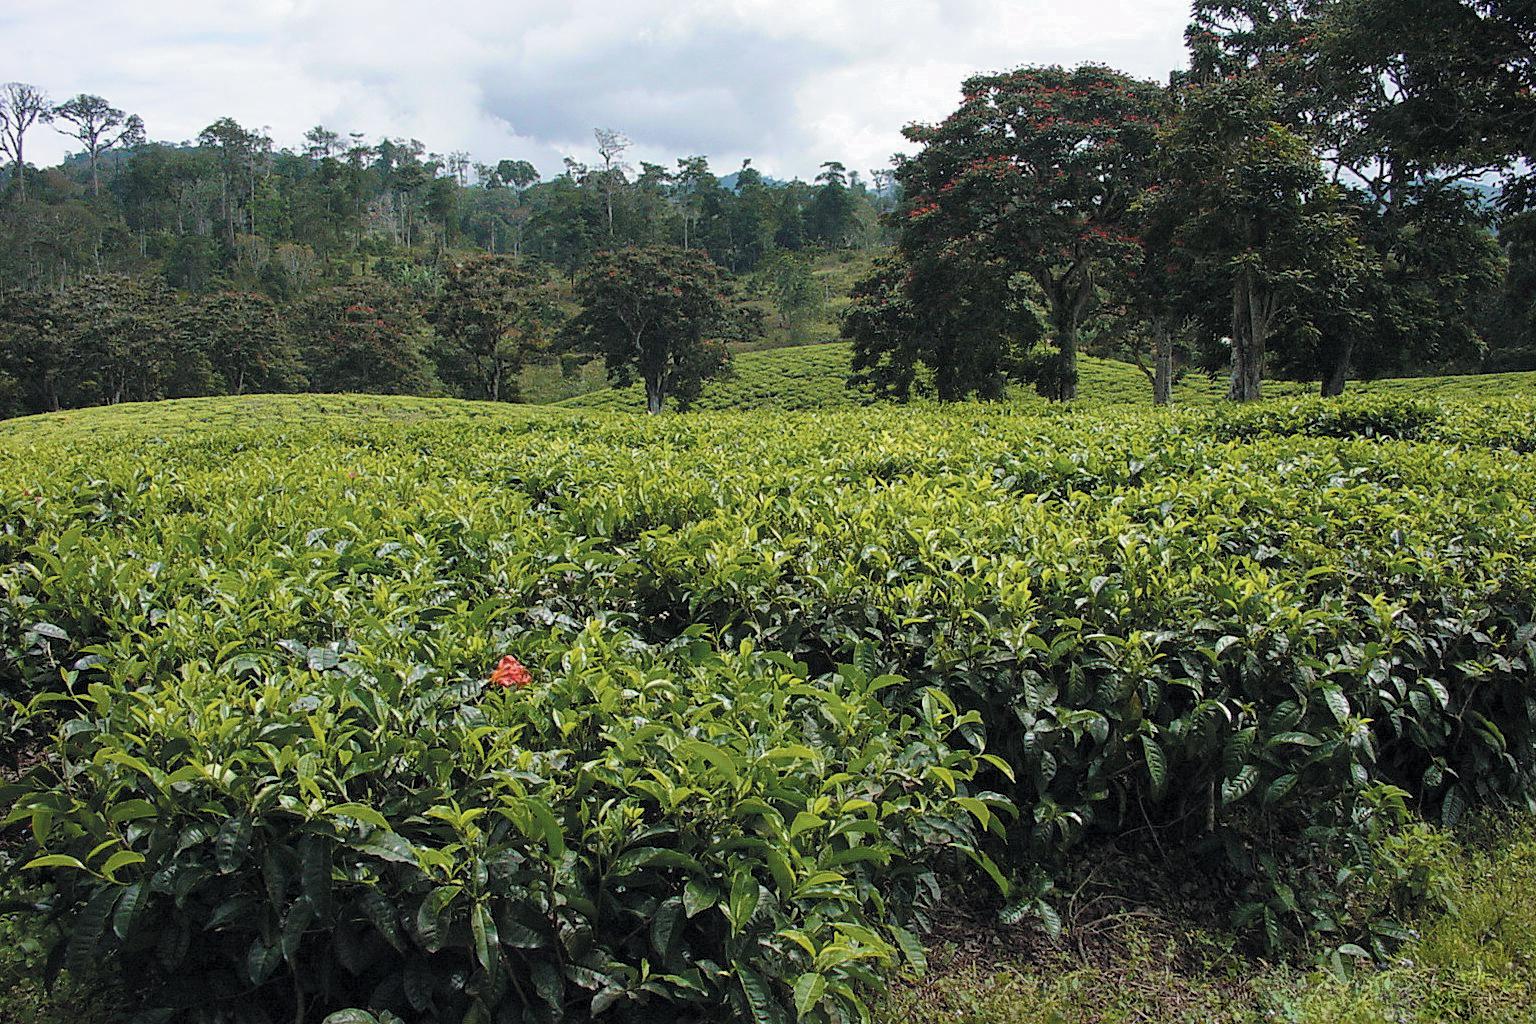 A color photo of a tea plantation in Tanzania